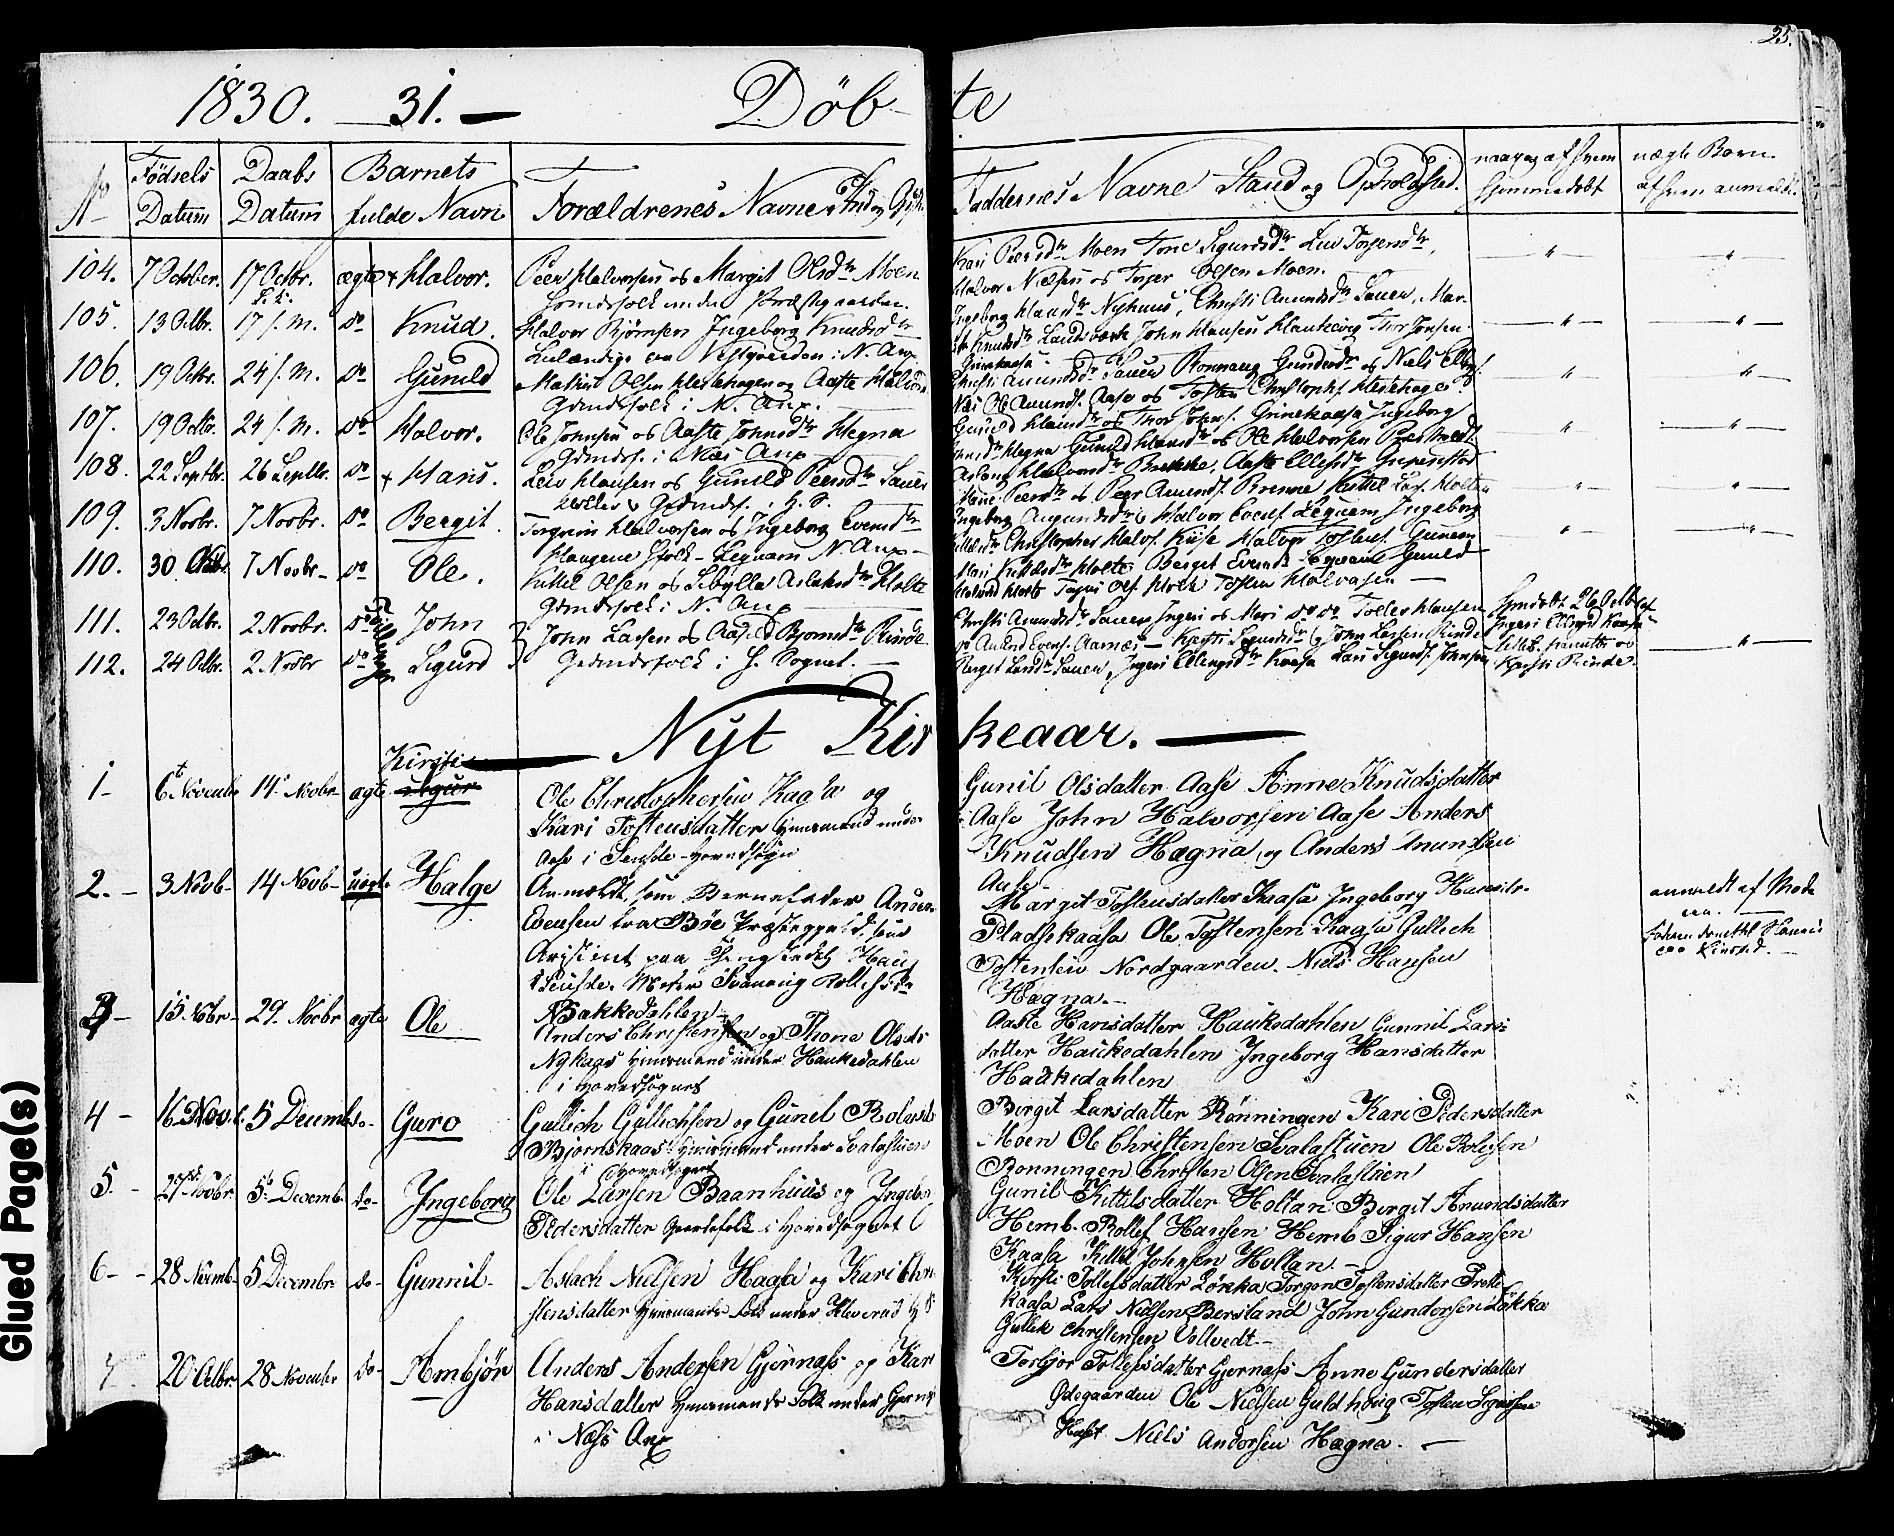 SAKO, Sauherad kirkebøker, F/Fa/L0006: Ministerialbok nr. I 6, 1827-1850, s. 25